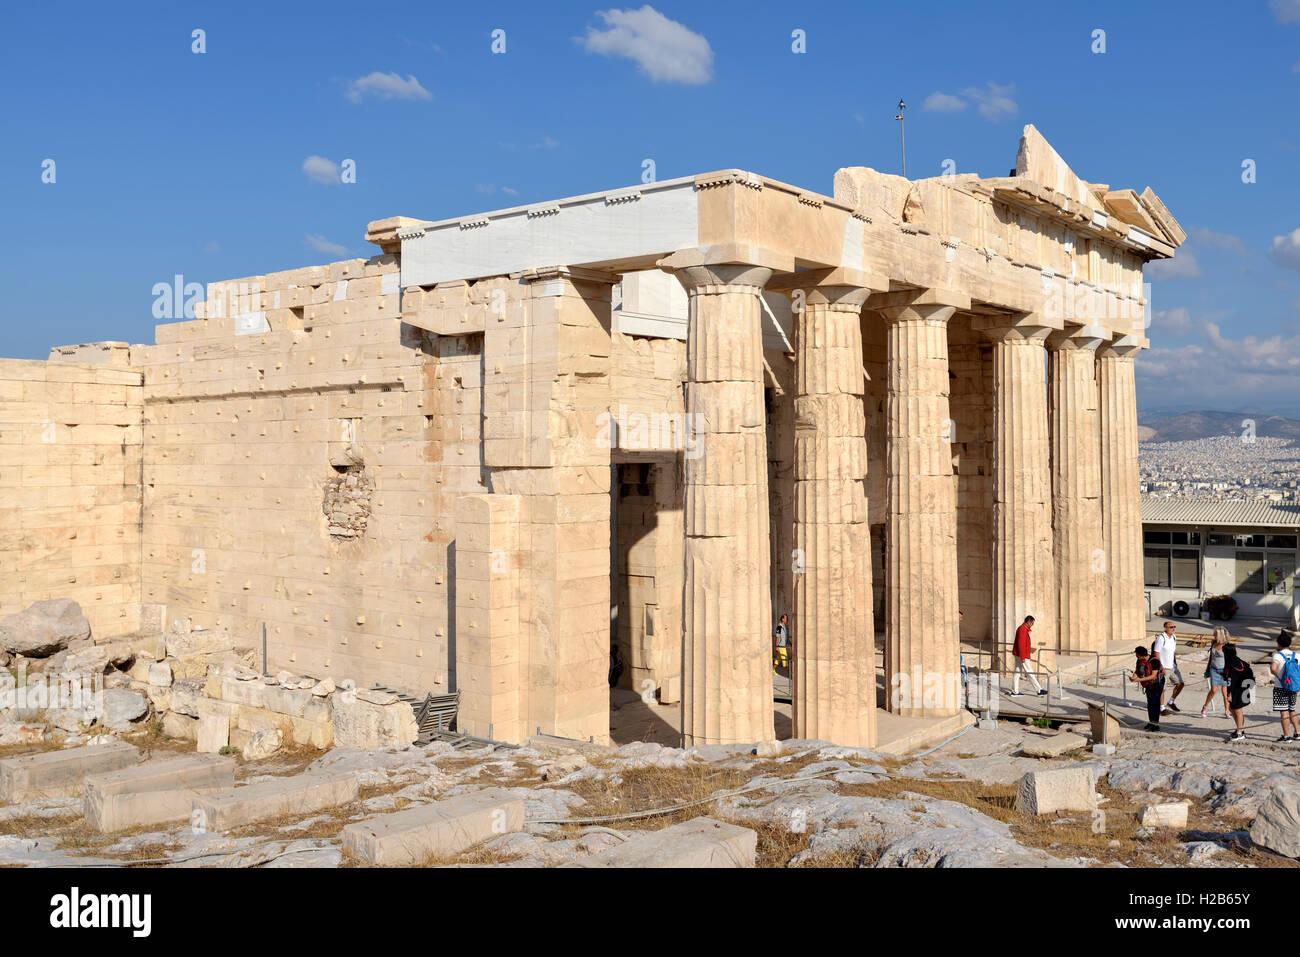 Propylaea in Acropolis of Athens, Greece - Stock Image